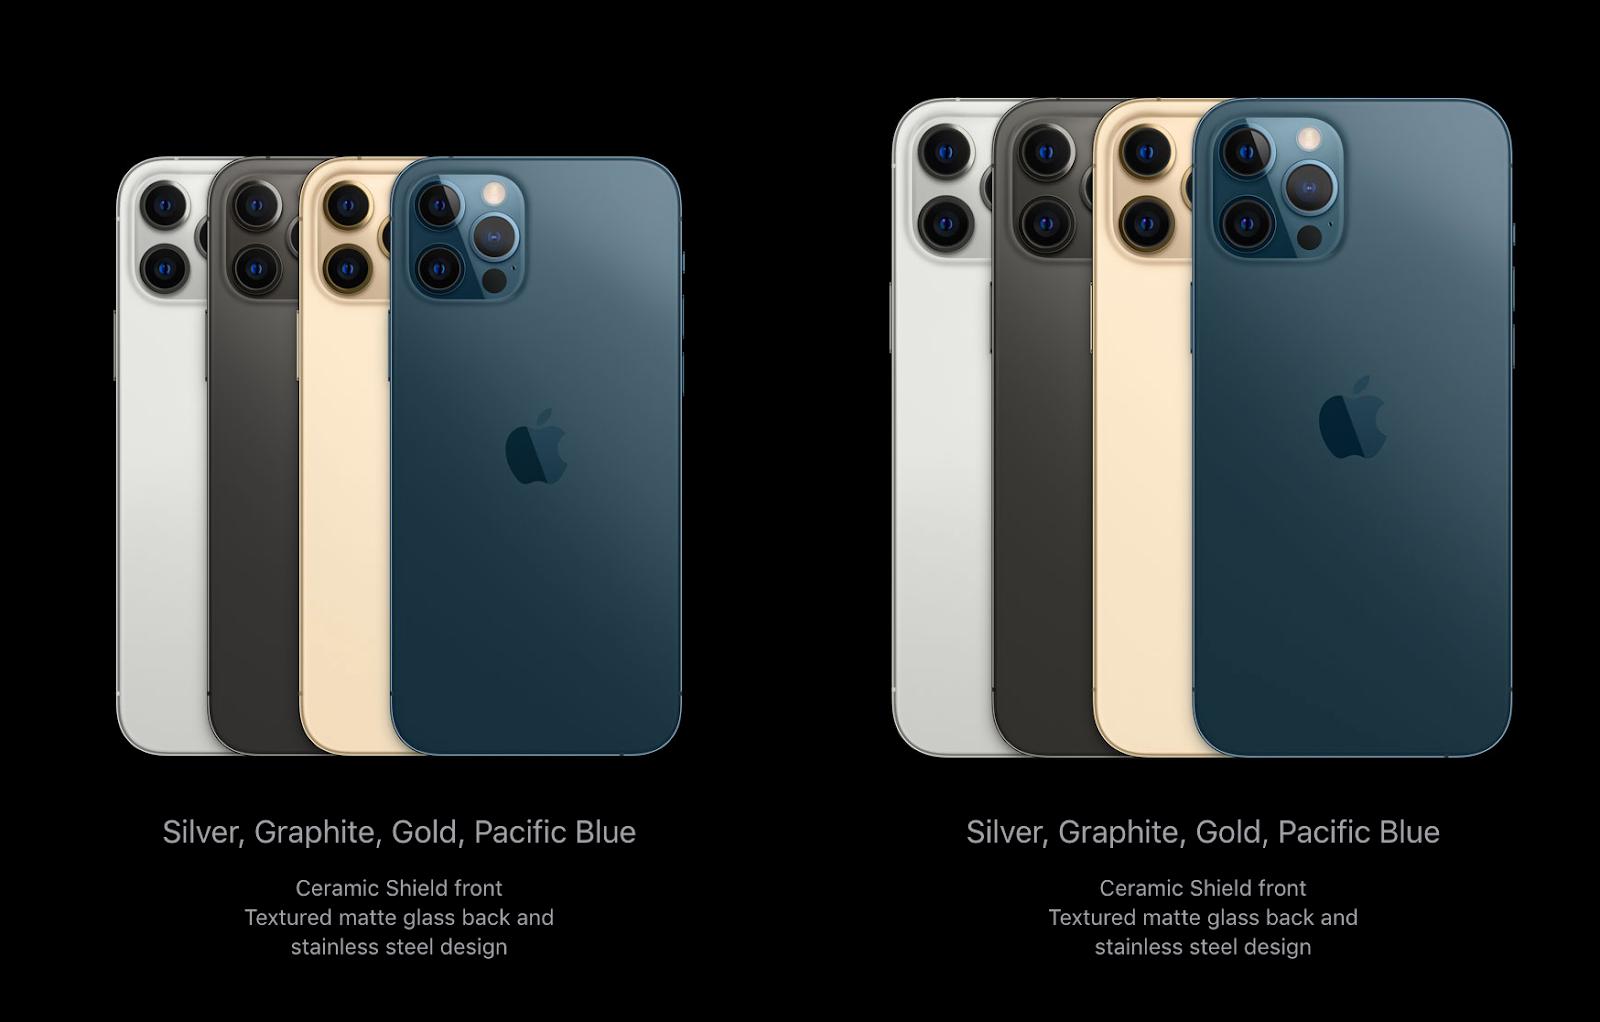 iPhone 12 Pro vs Pro Max